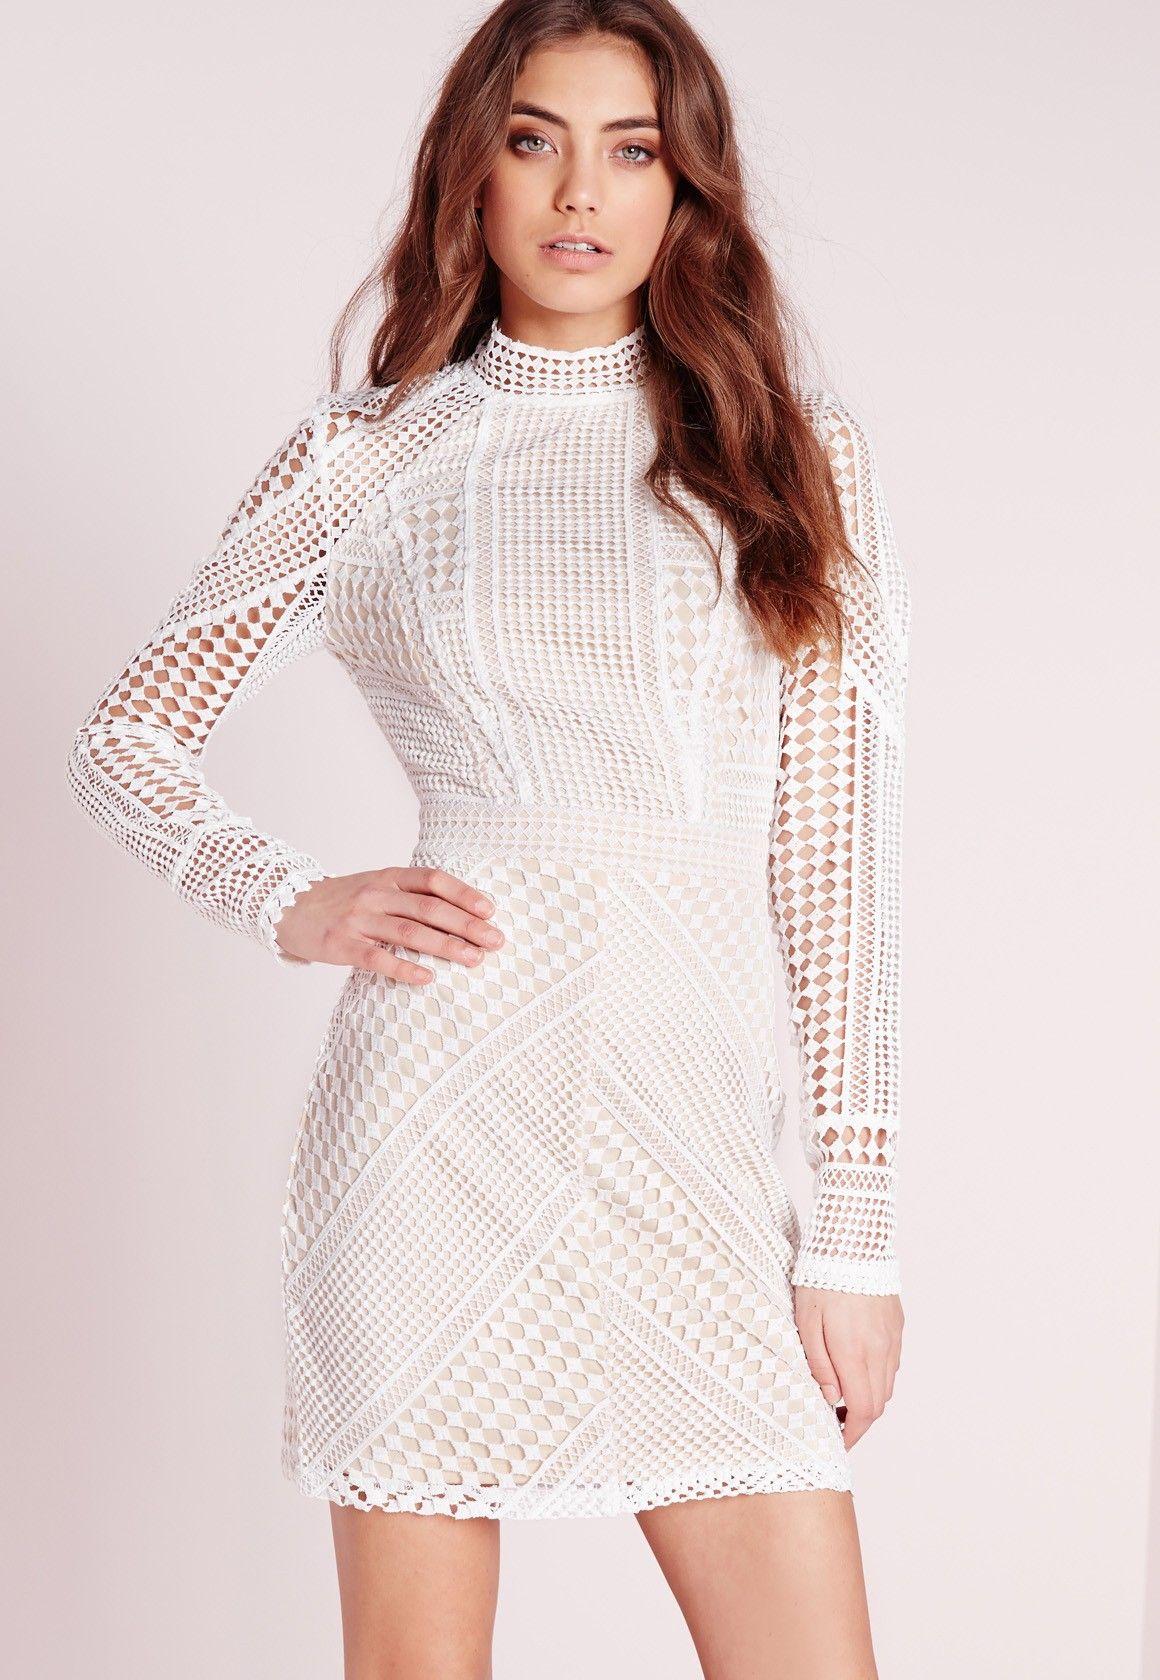 753038779b9c Missguided - Structured High Neck Premium Lace Mini Dress White